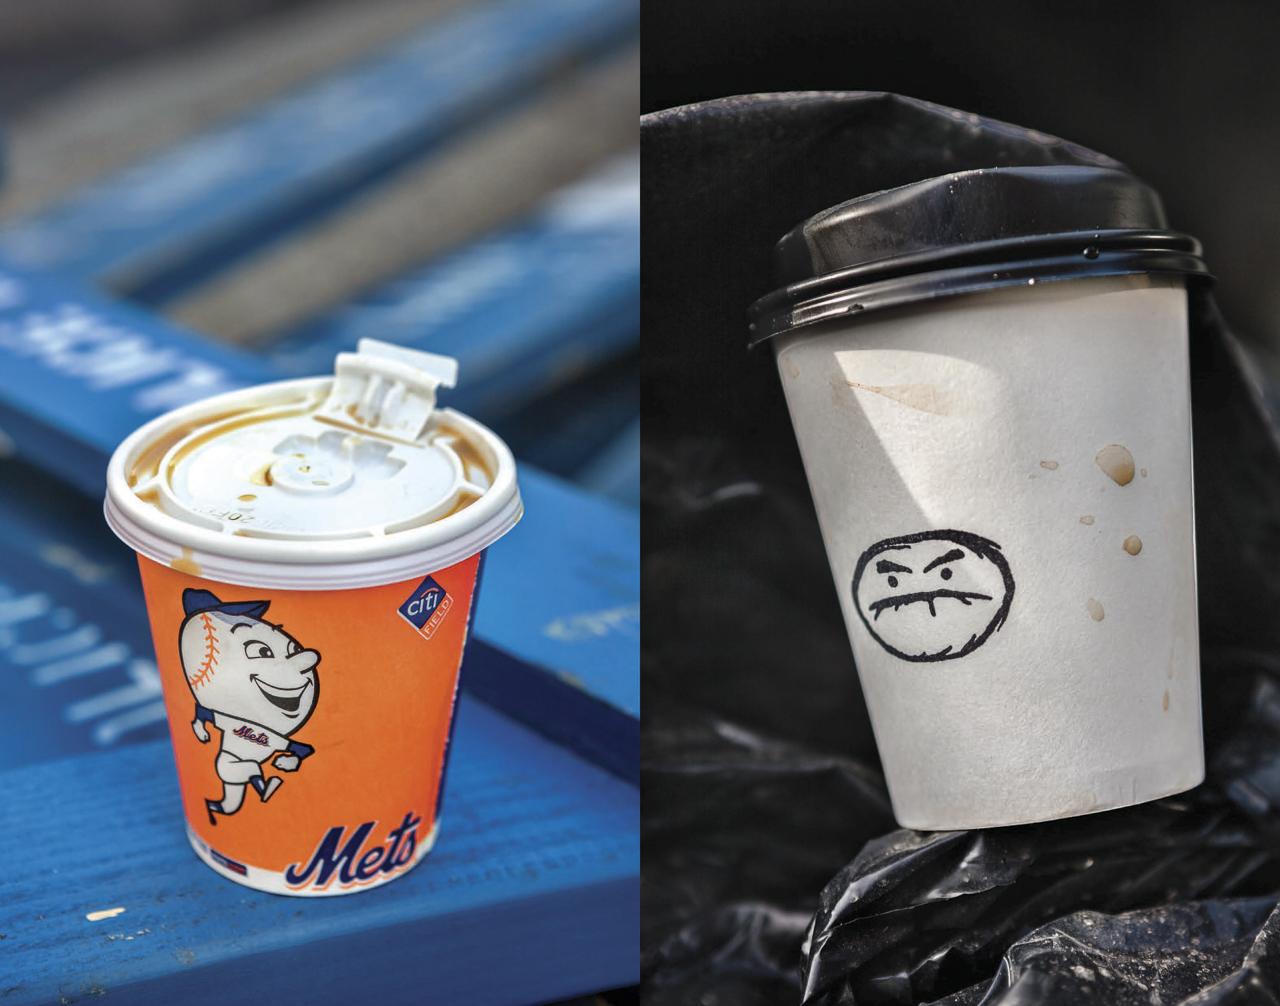 Morning Joe: Photographs by David JosephDesign and Photo Editing by Paula GillenPrinter: Magcloud